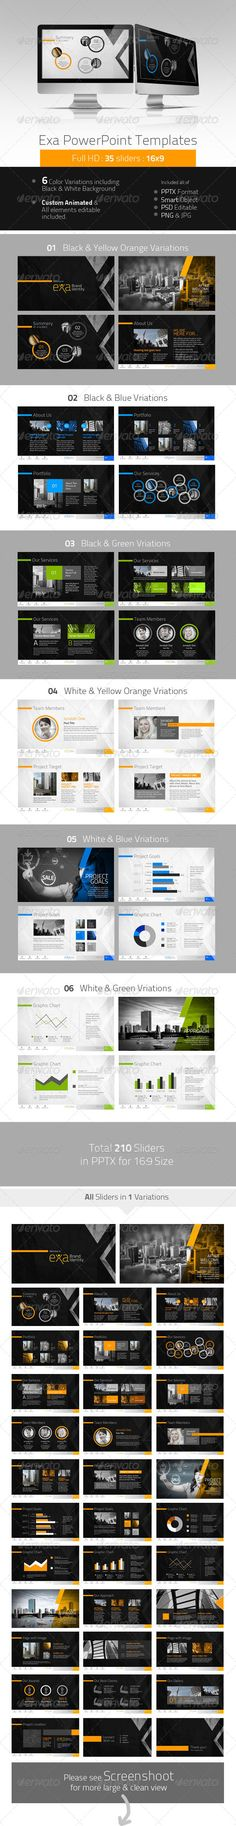 Exa Creative PowerPoint Presentation - Presentation Templates